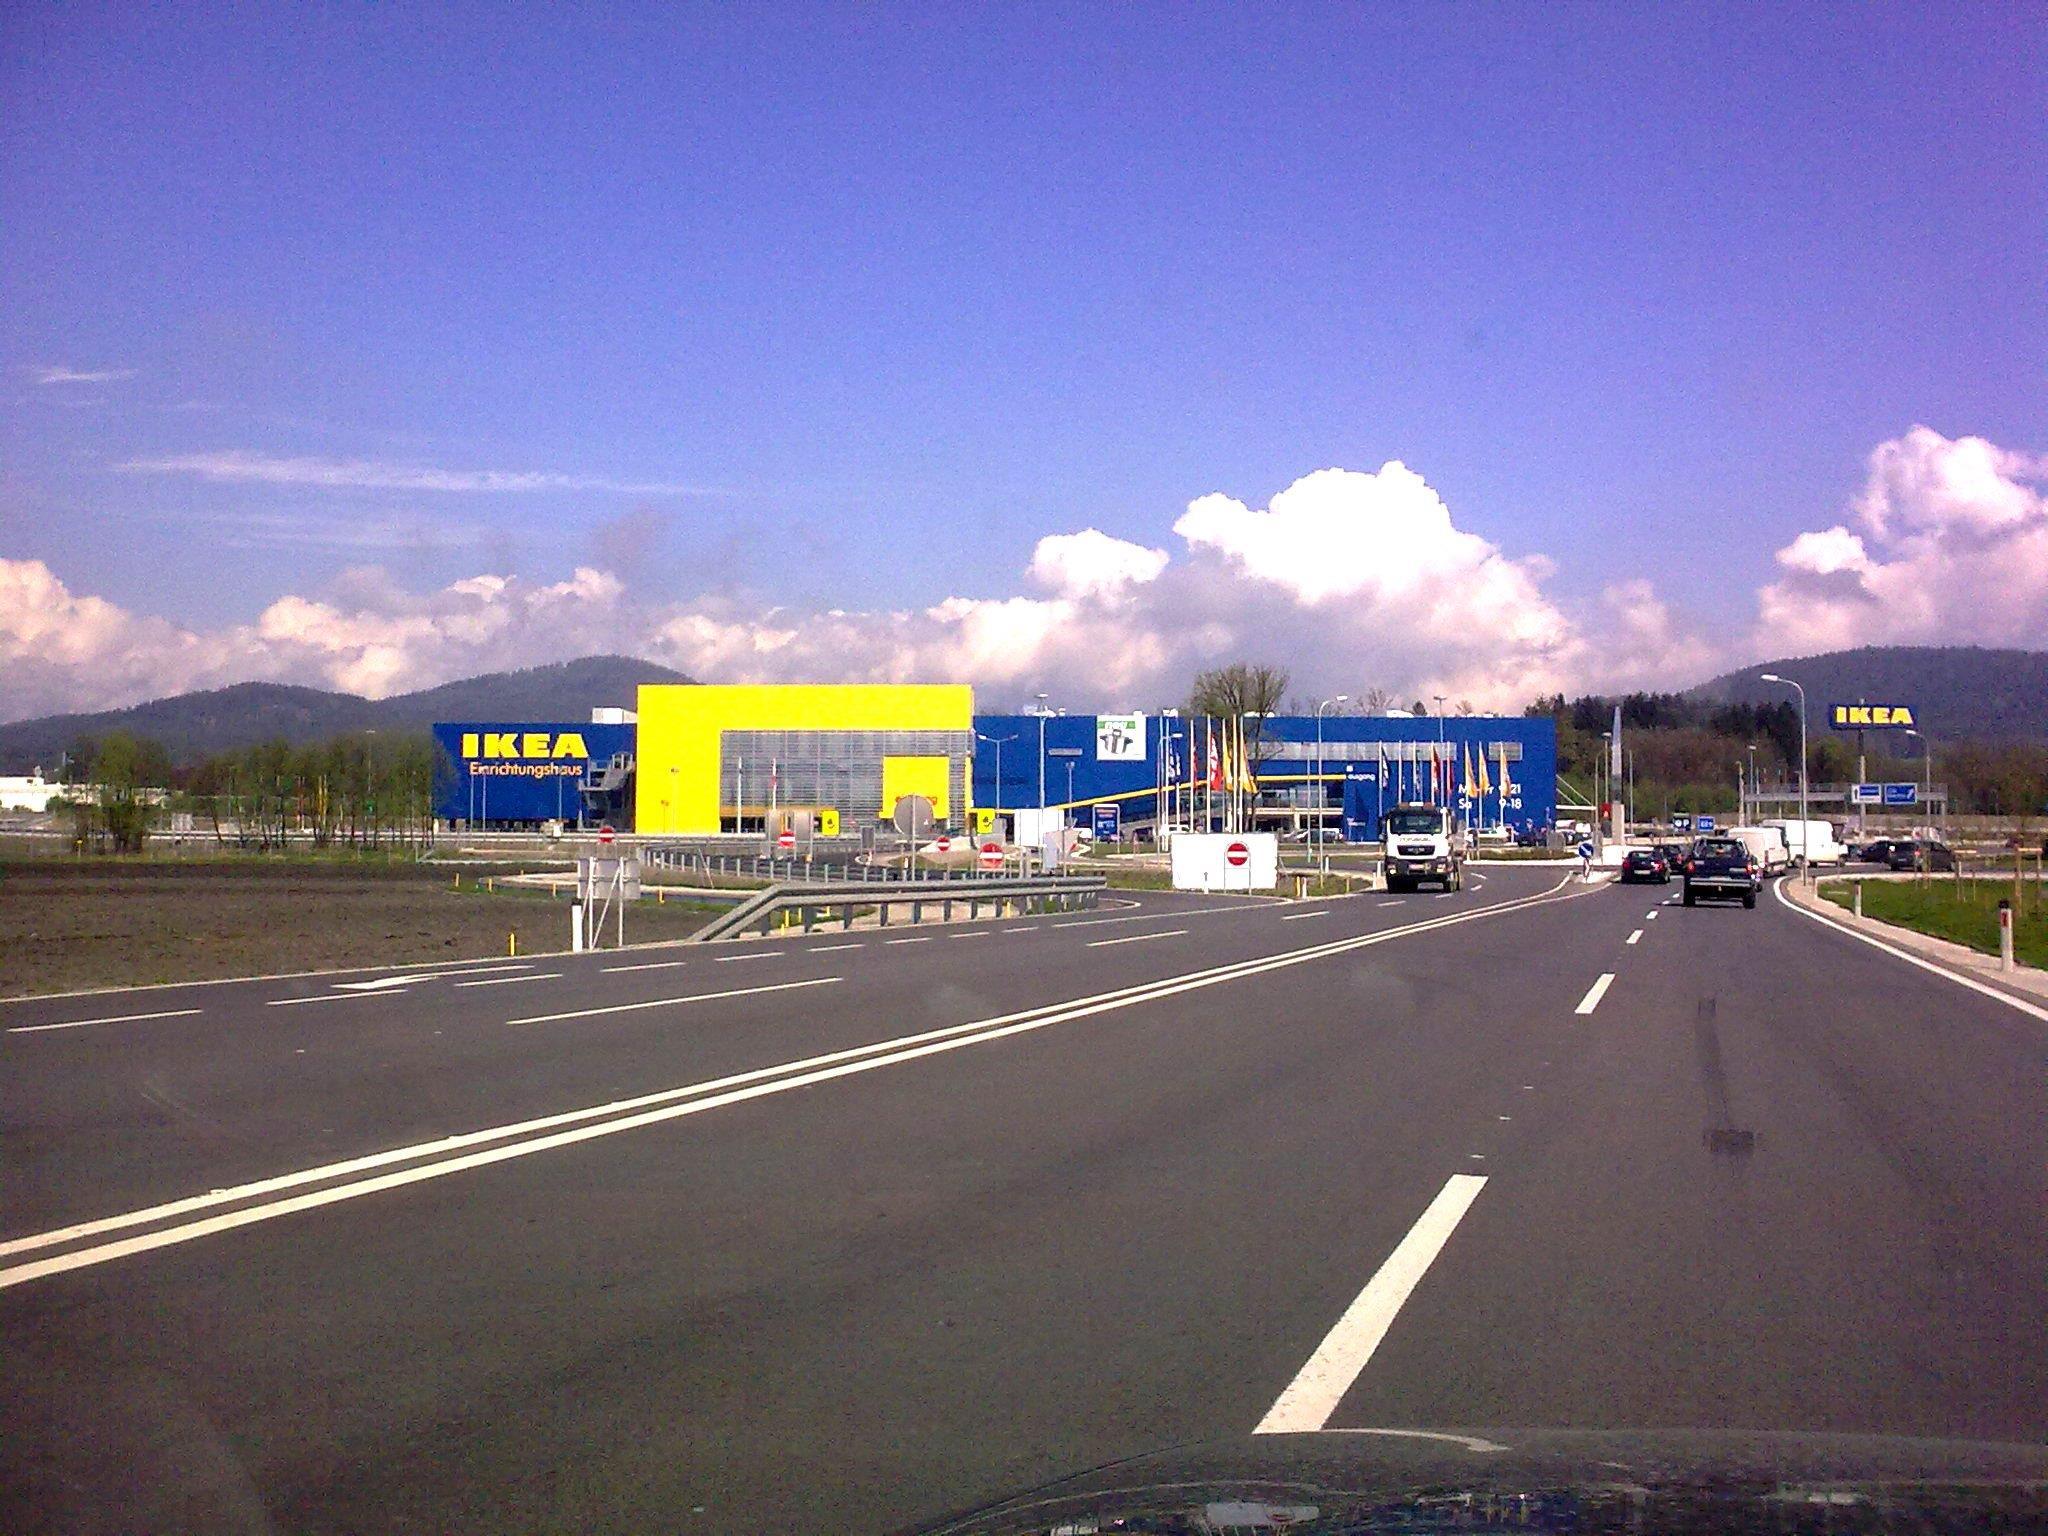 Vorarlberg Ikea Lustenau Will Im Sommer 2019 Eröffnen Lustenau